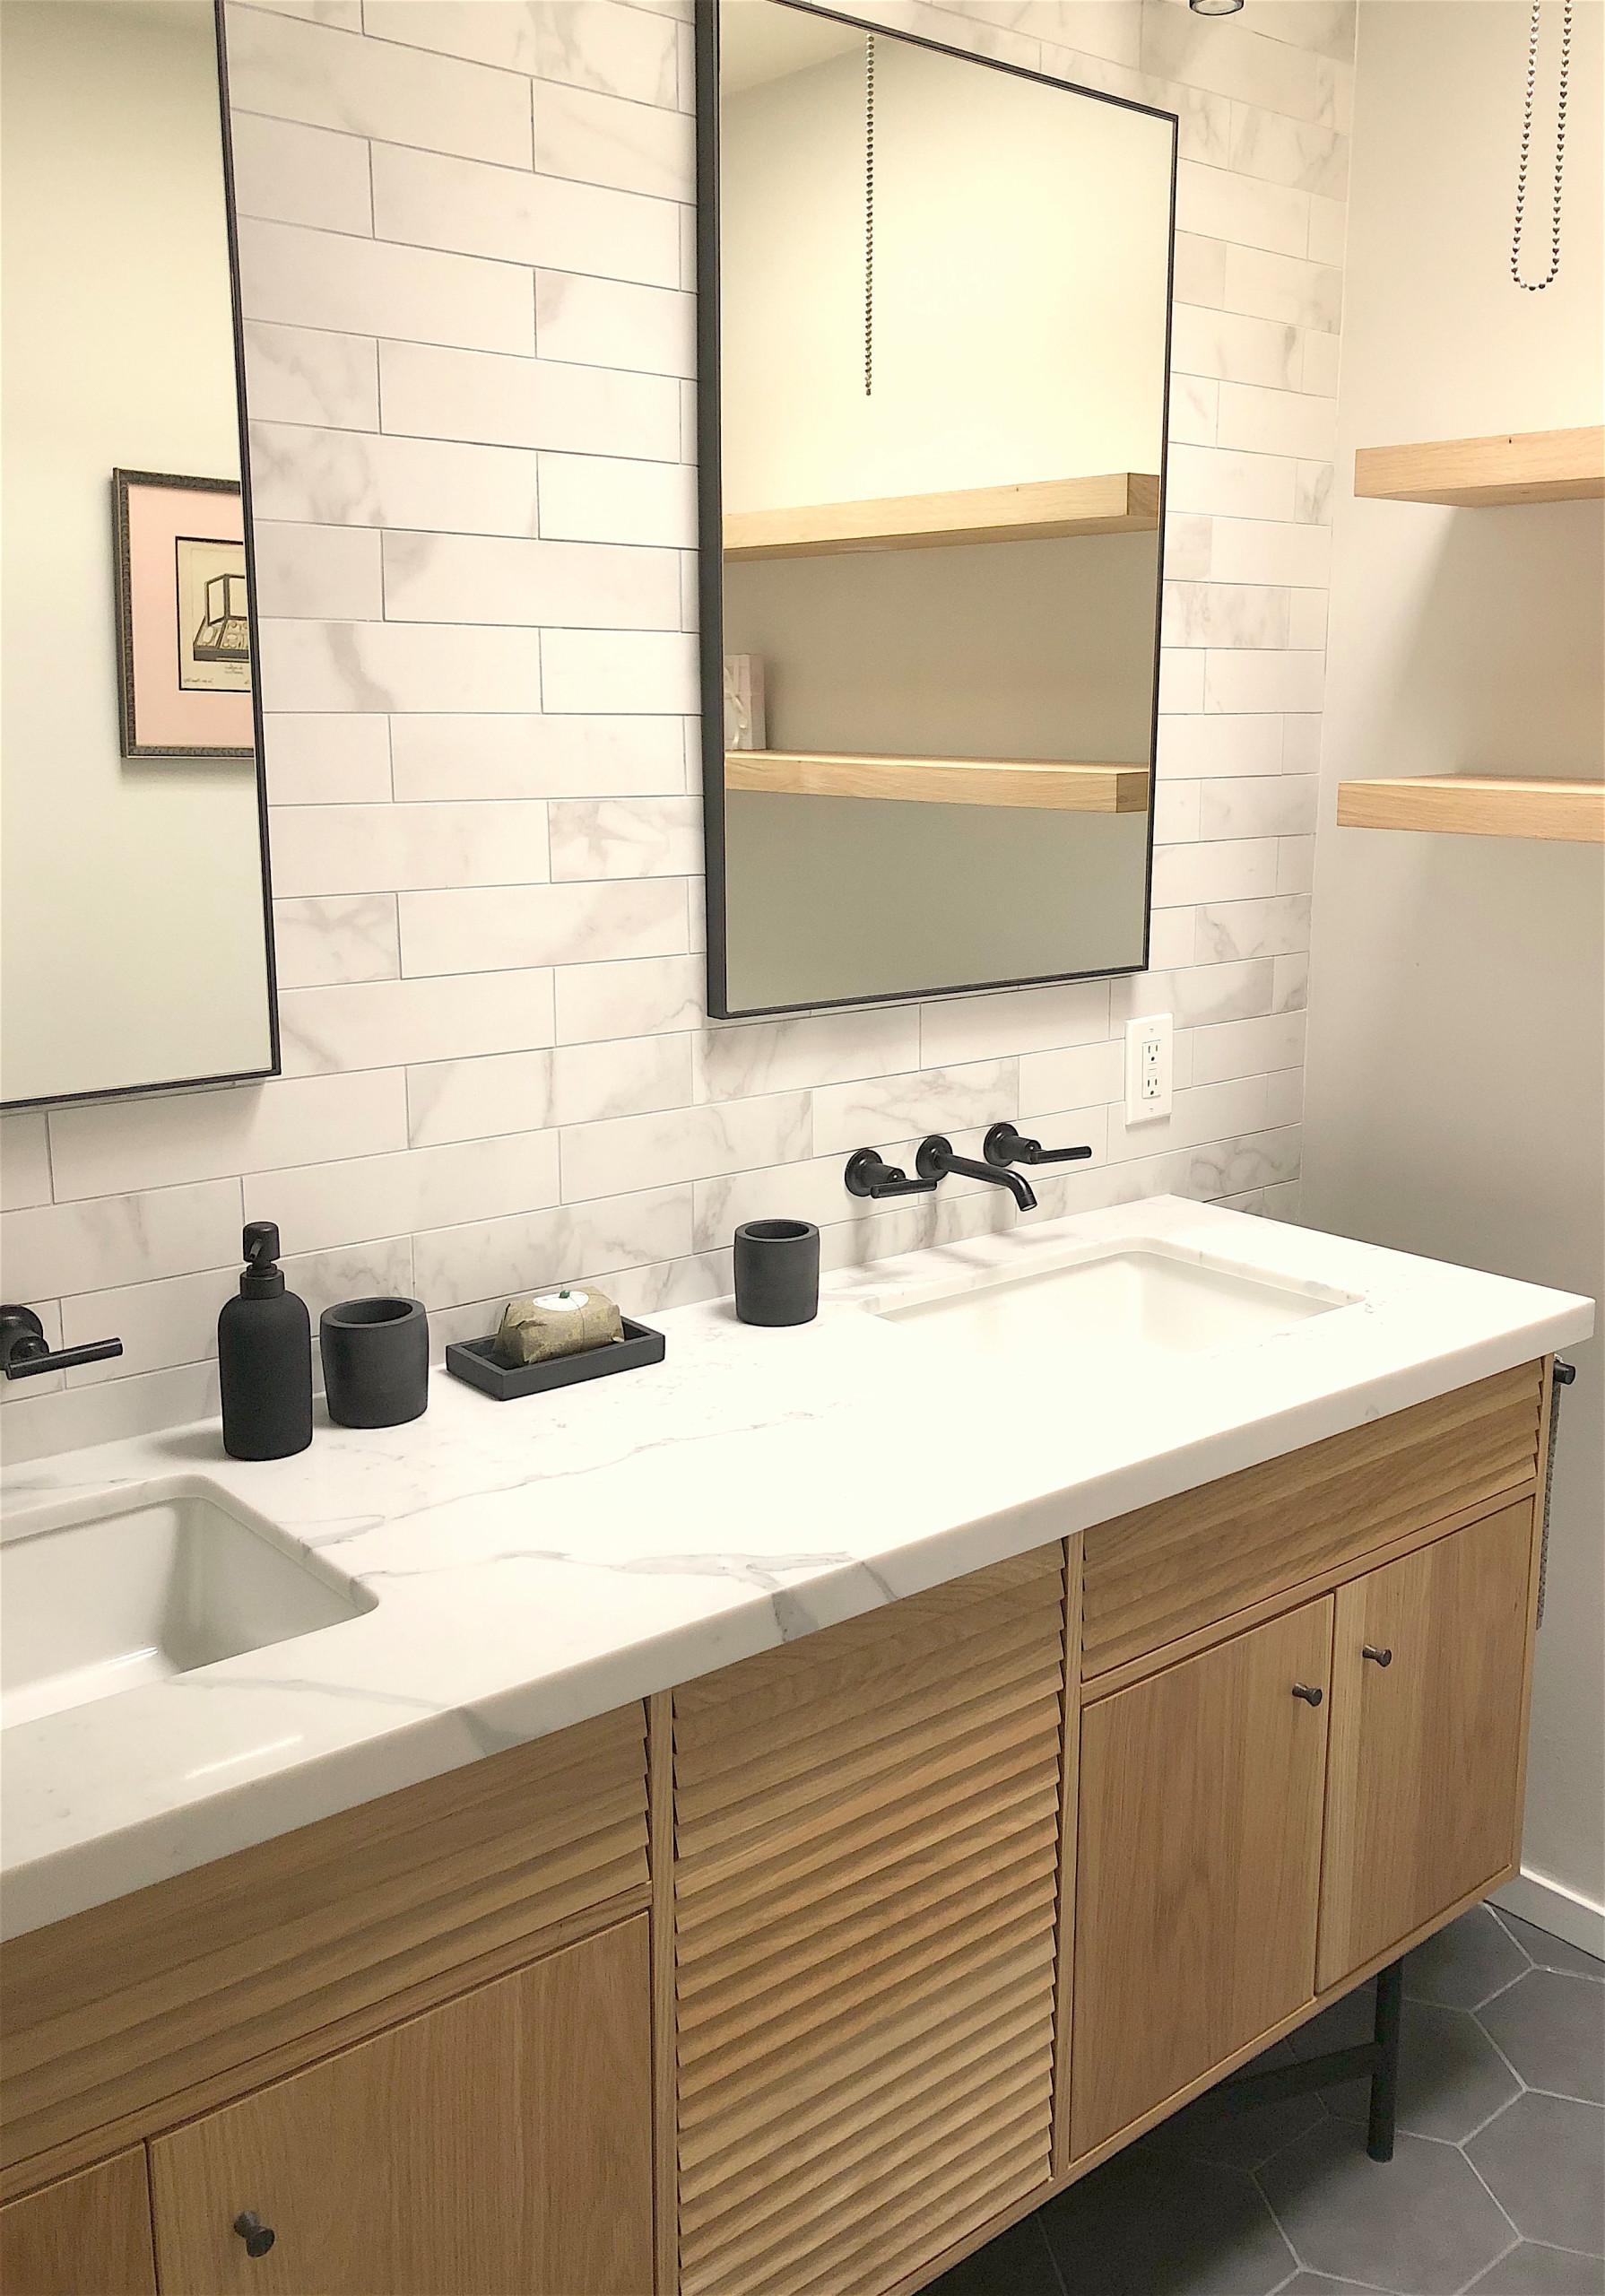 Tiny Daly City Bathroom gets renovated, 2020